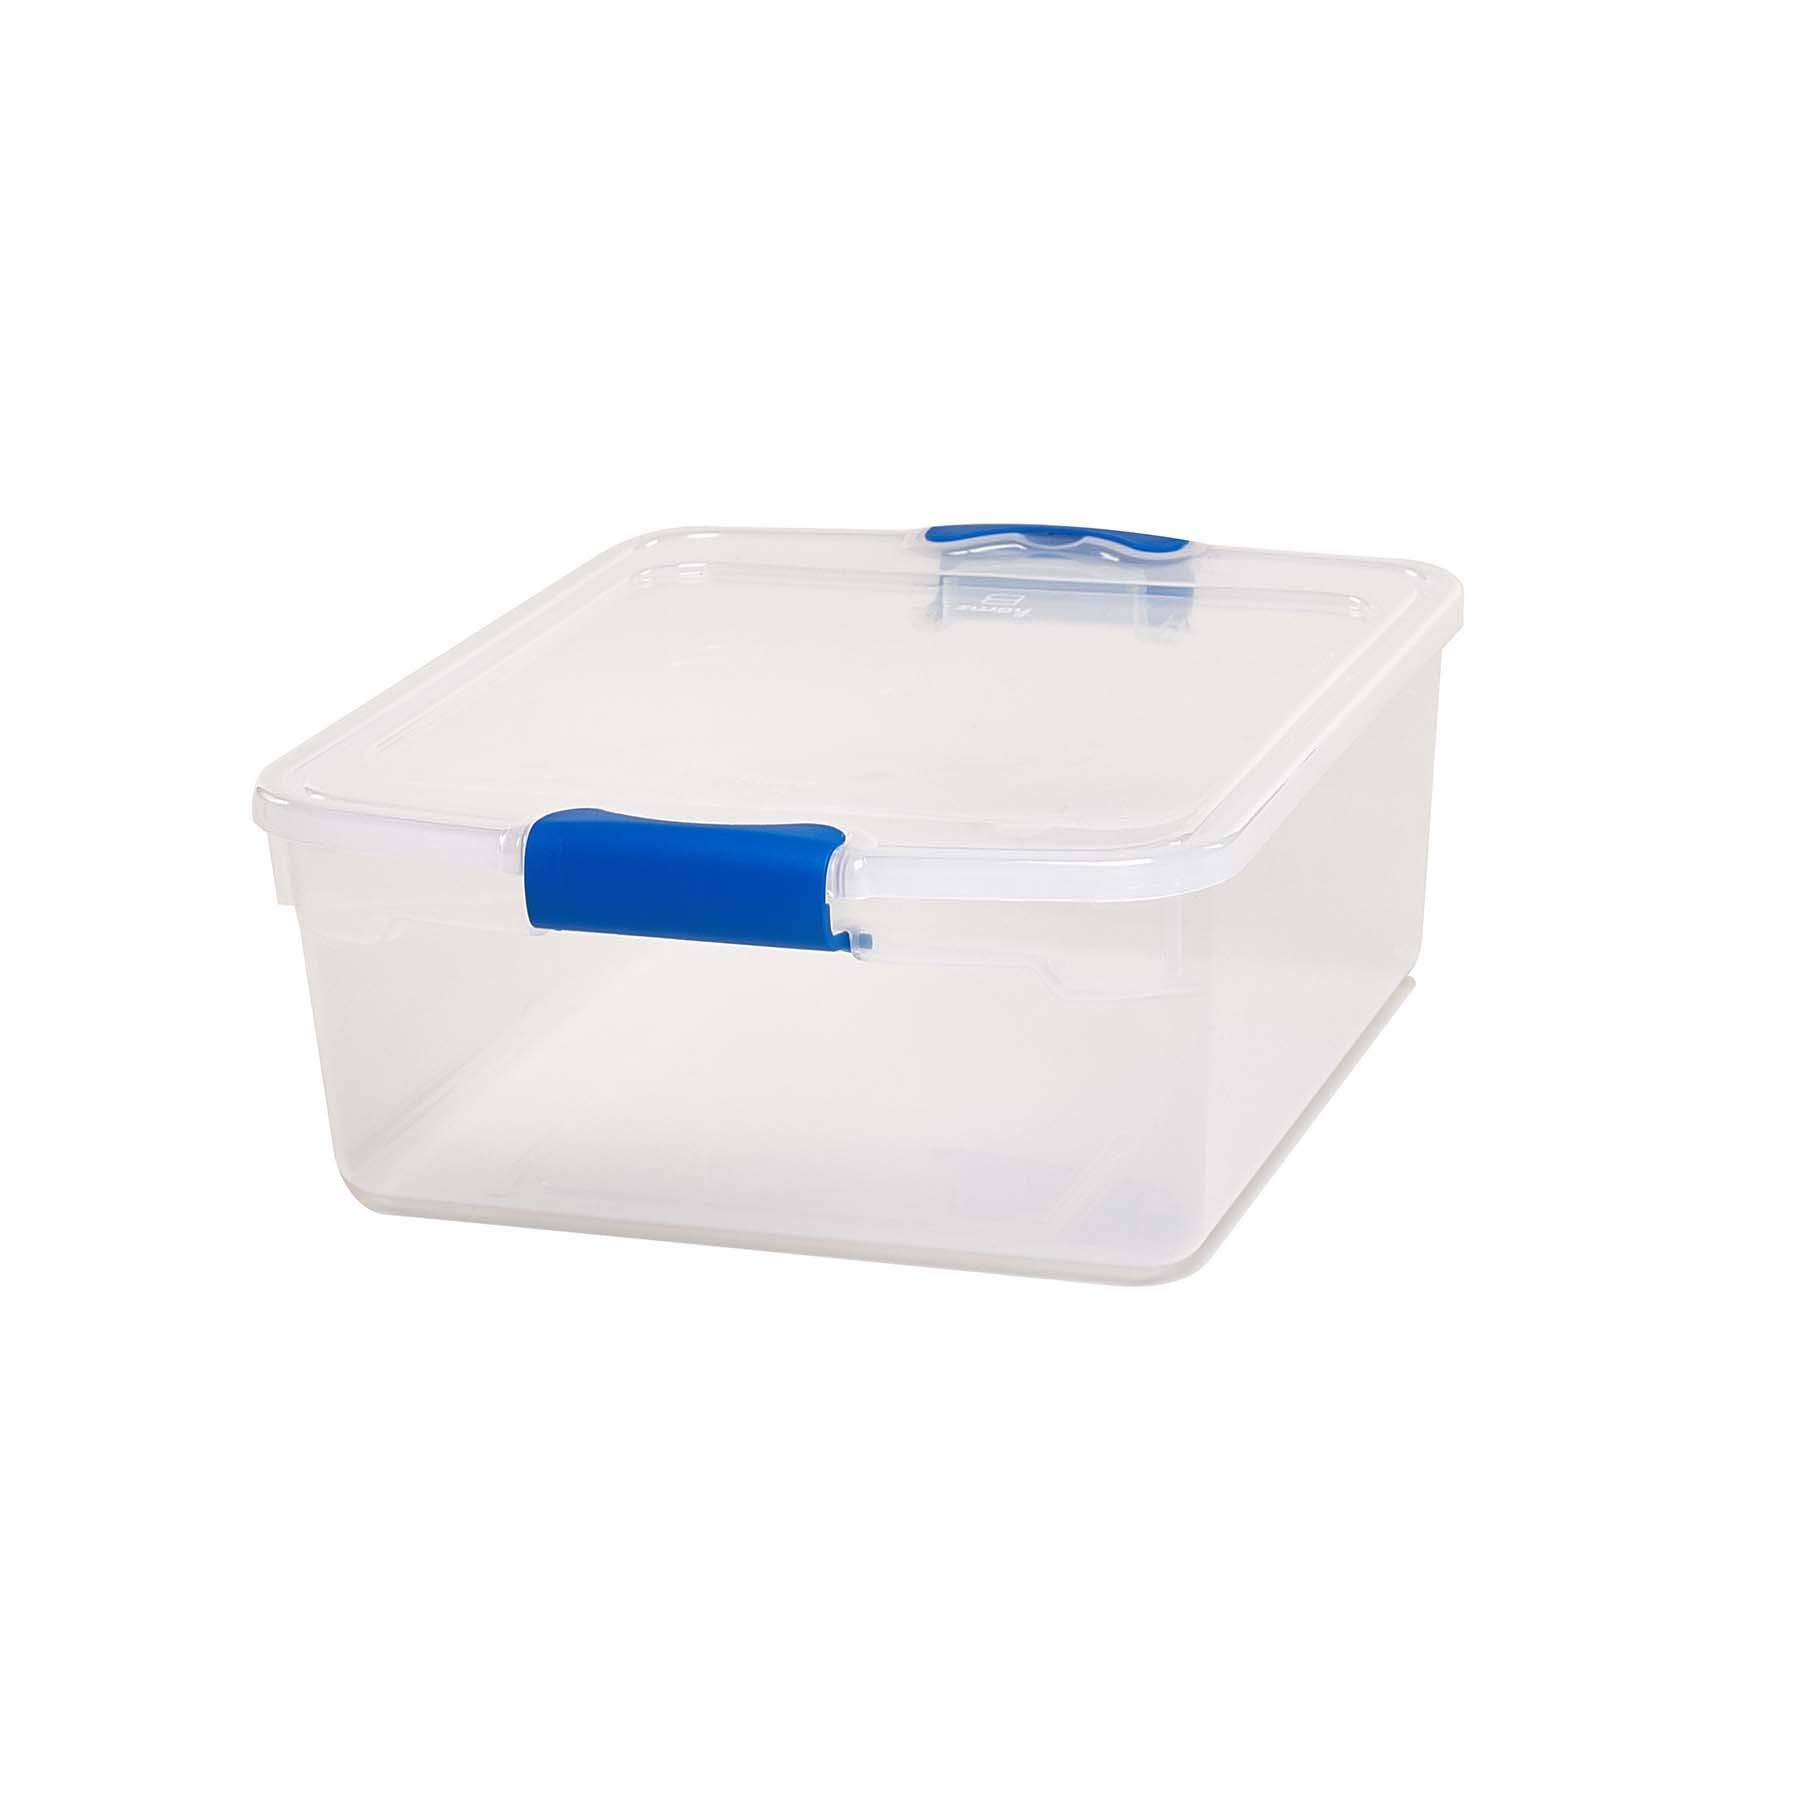 Homz Plastic Storage Stackable Latching